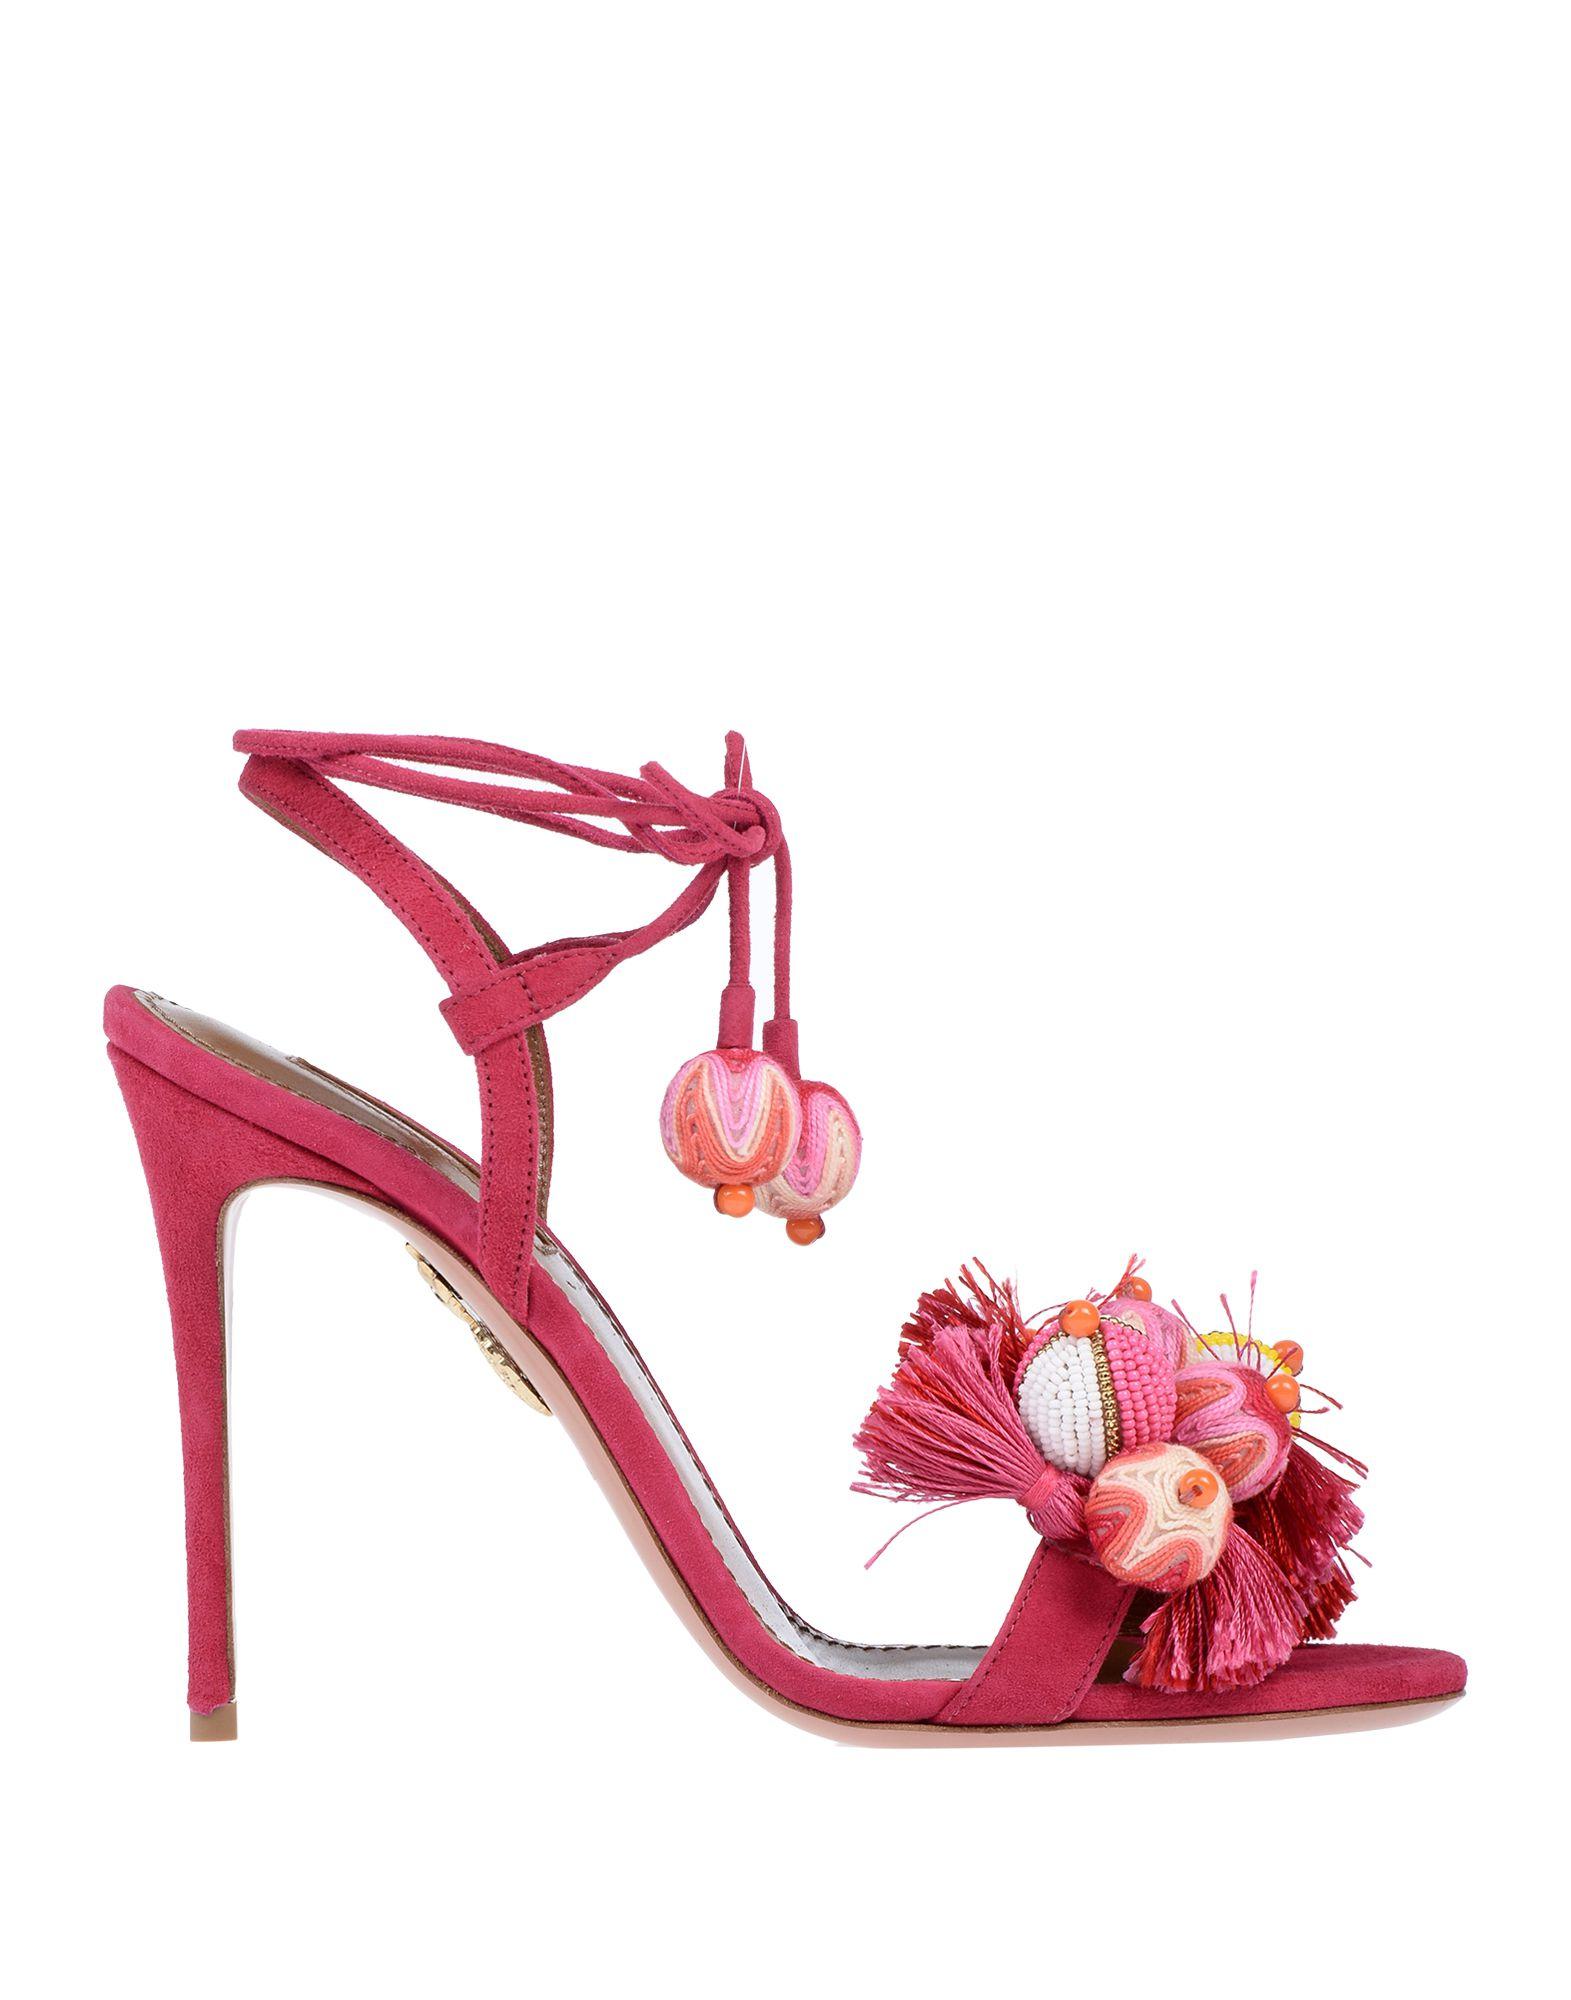 running shoes really comfortable promo code Aquazzura Sandals - Women Aquazzura Sandals online on YOOX ...